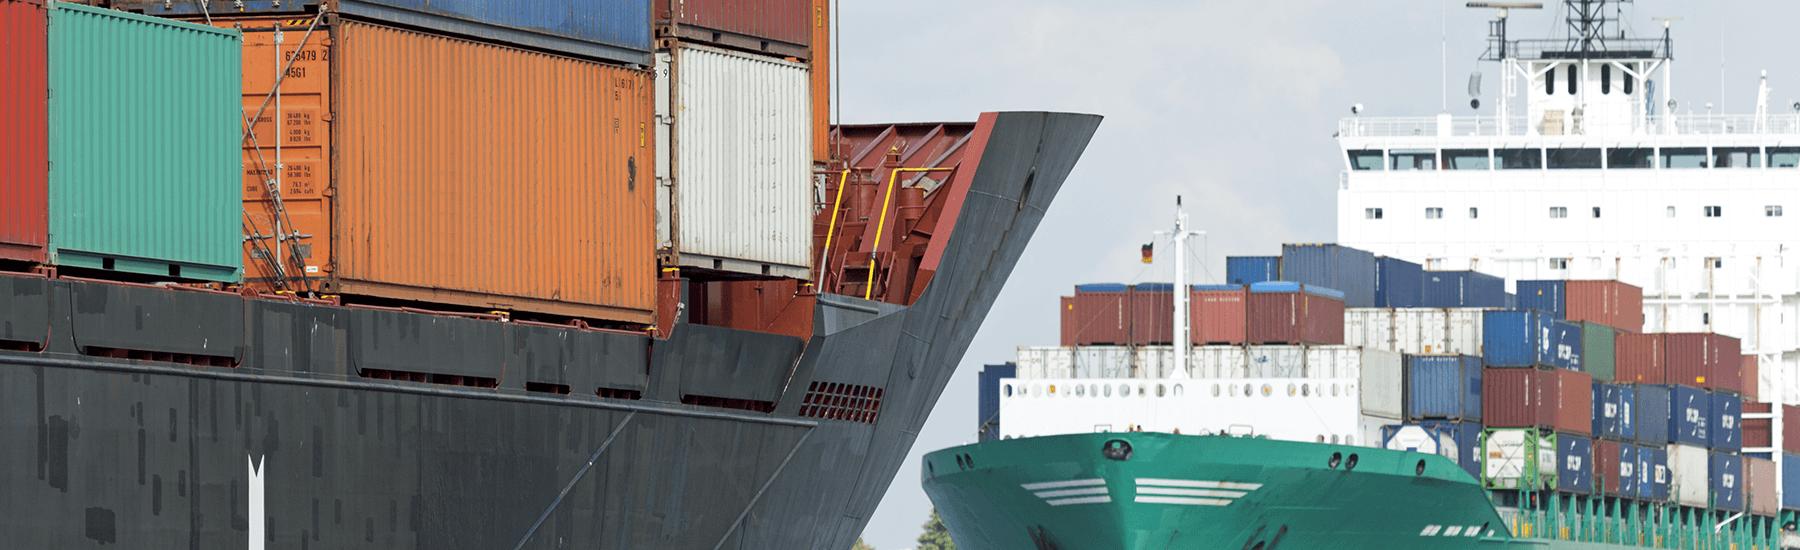 initiative_kiel_canal_schiffe_kiel_kanal_nord_ostsee_kanal-kopie